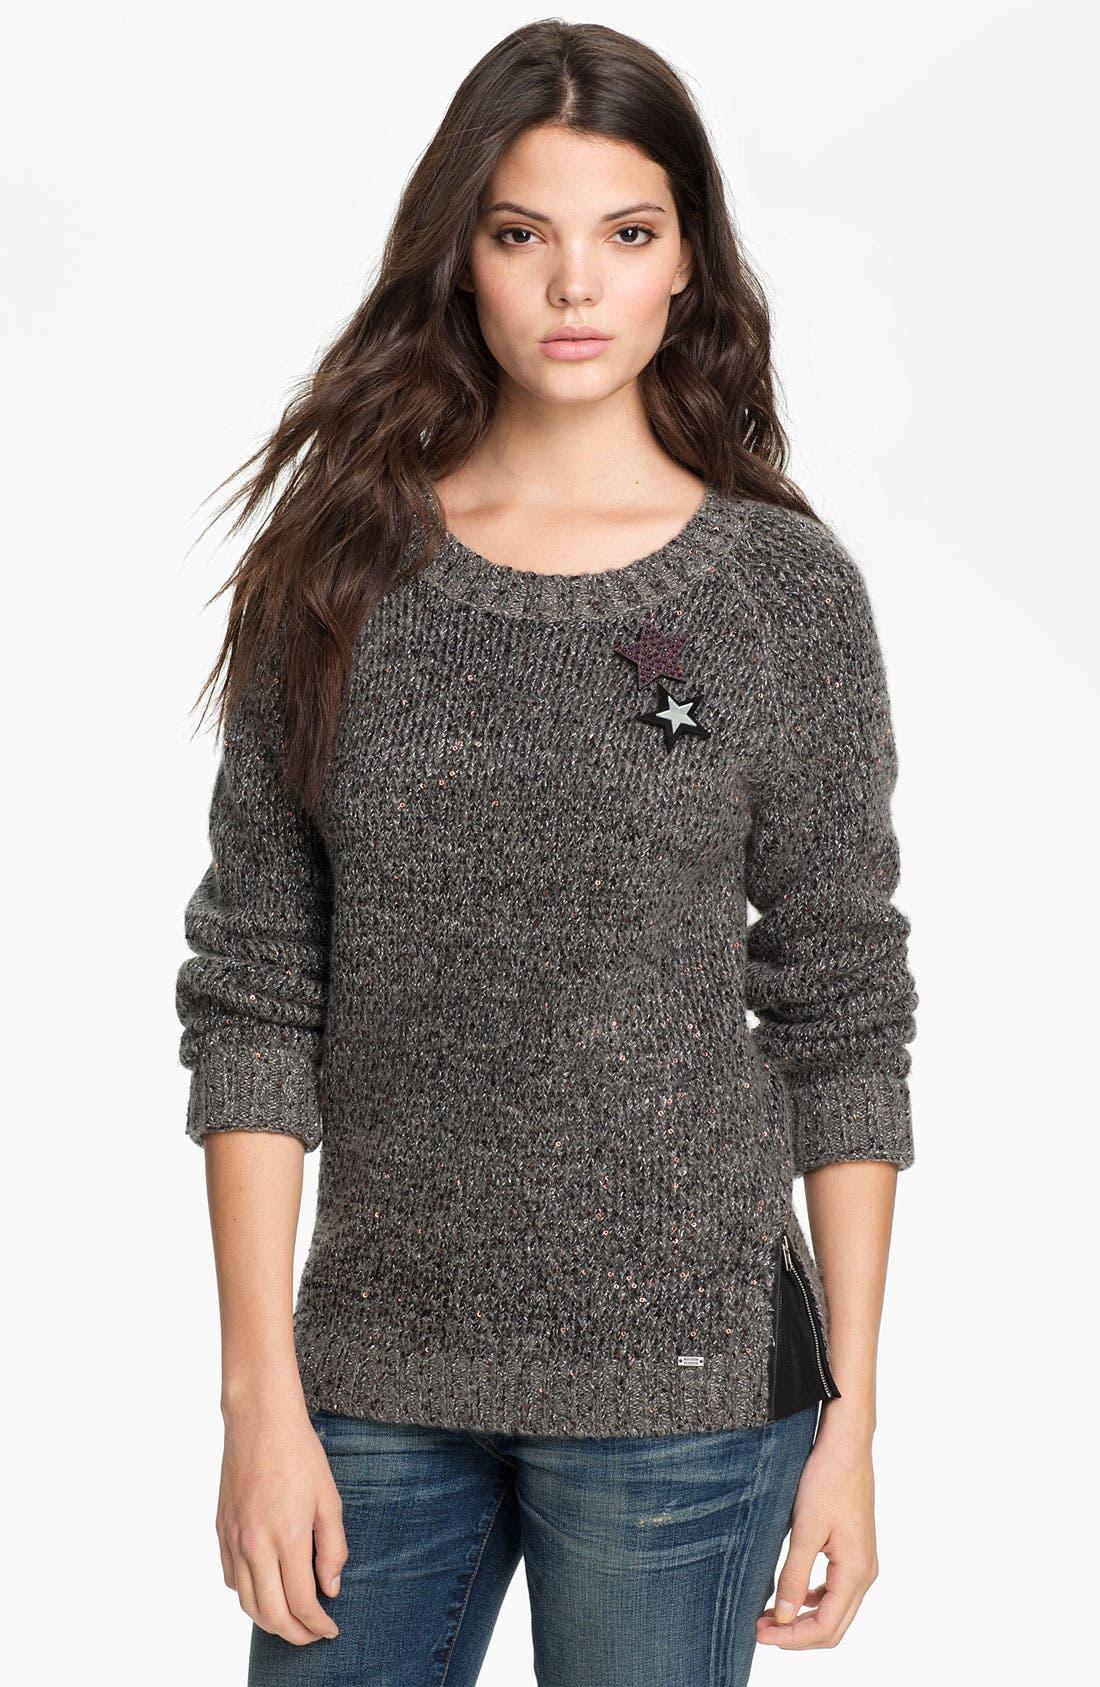 Main Image - Maison Scotch Sequin Sweater